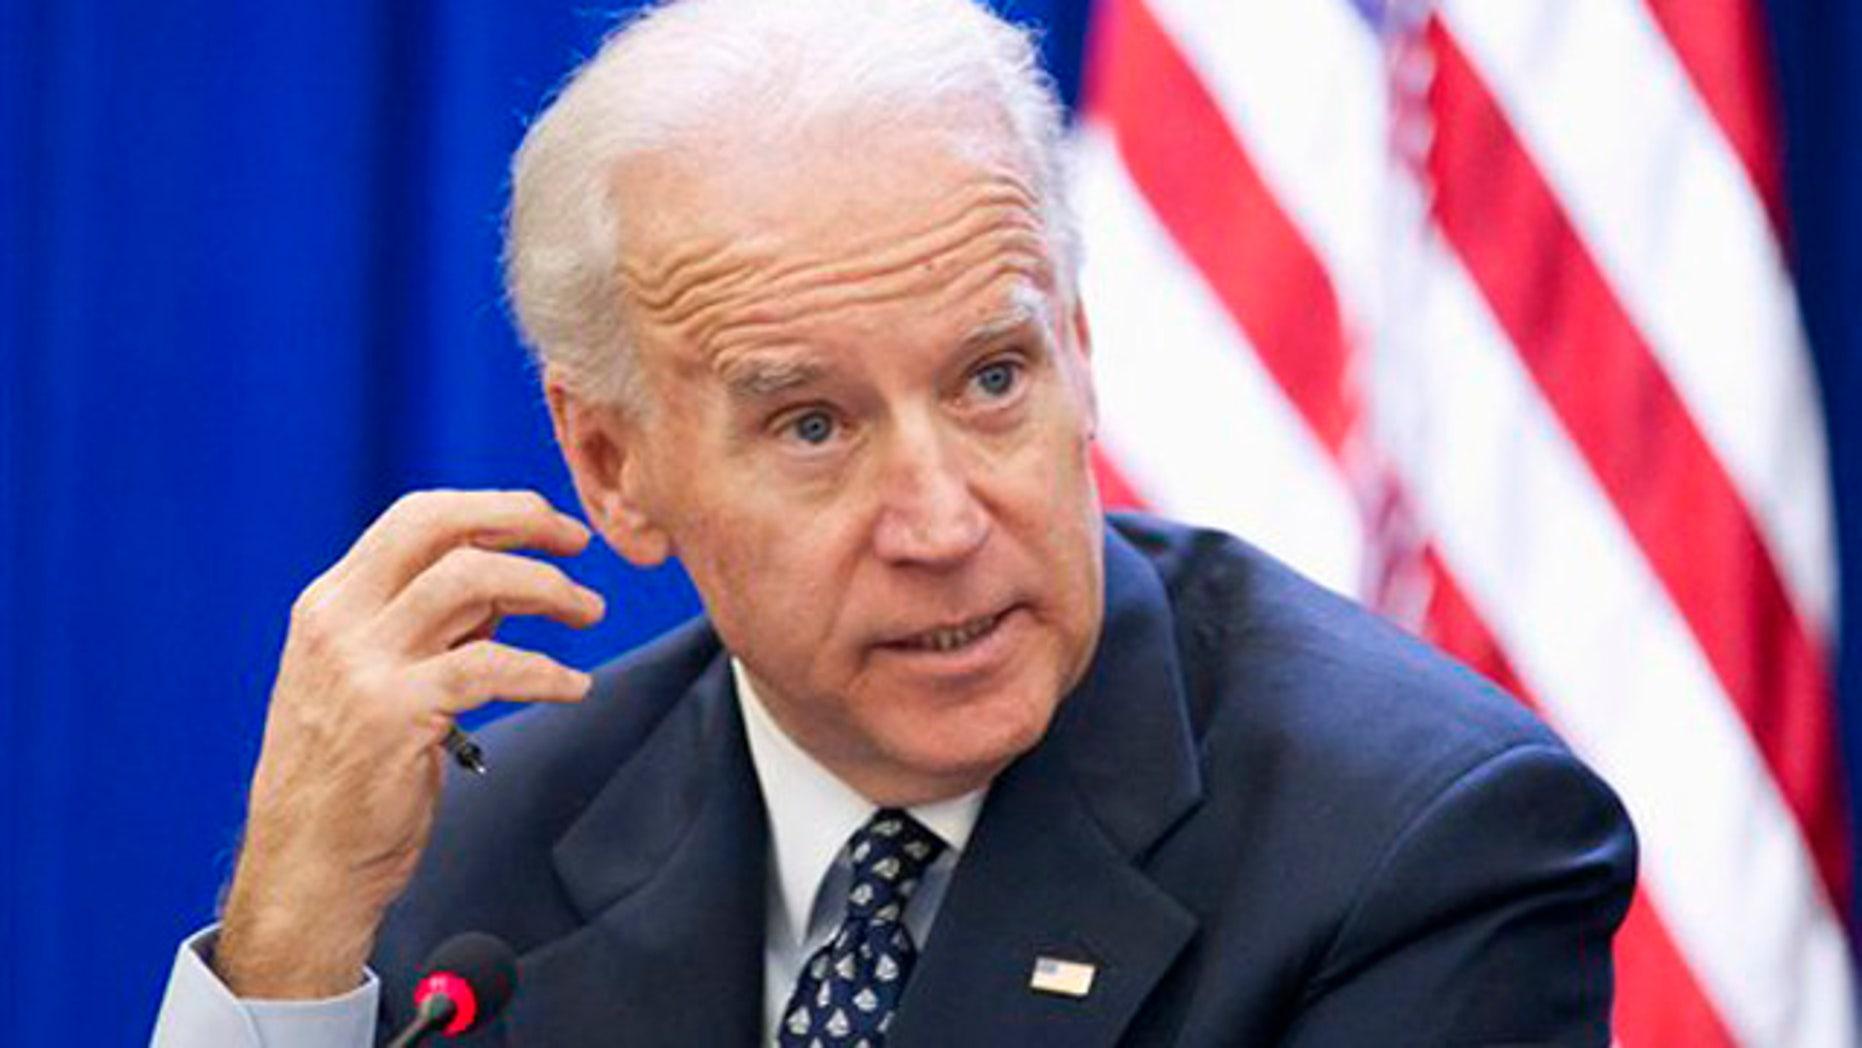 Dec. 13, 2011: Vice President Joe Biden hosts a Cabinet meeting in Washington.